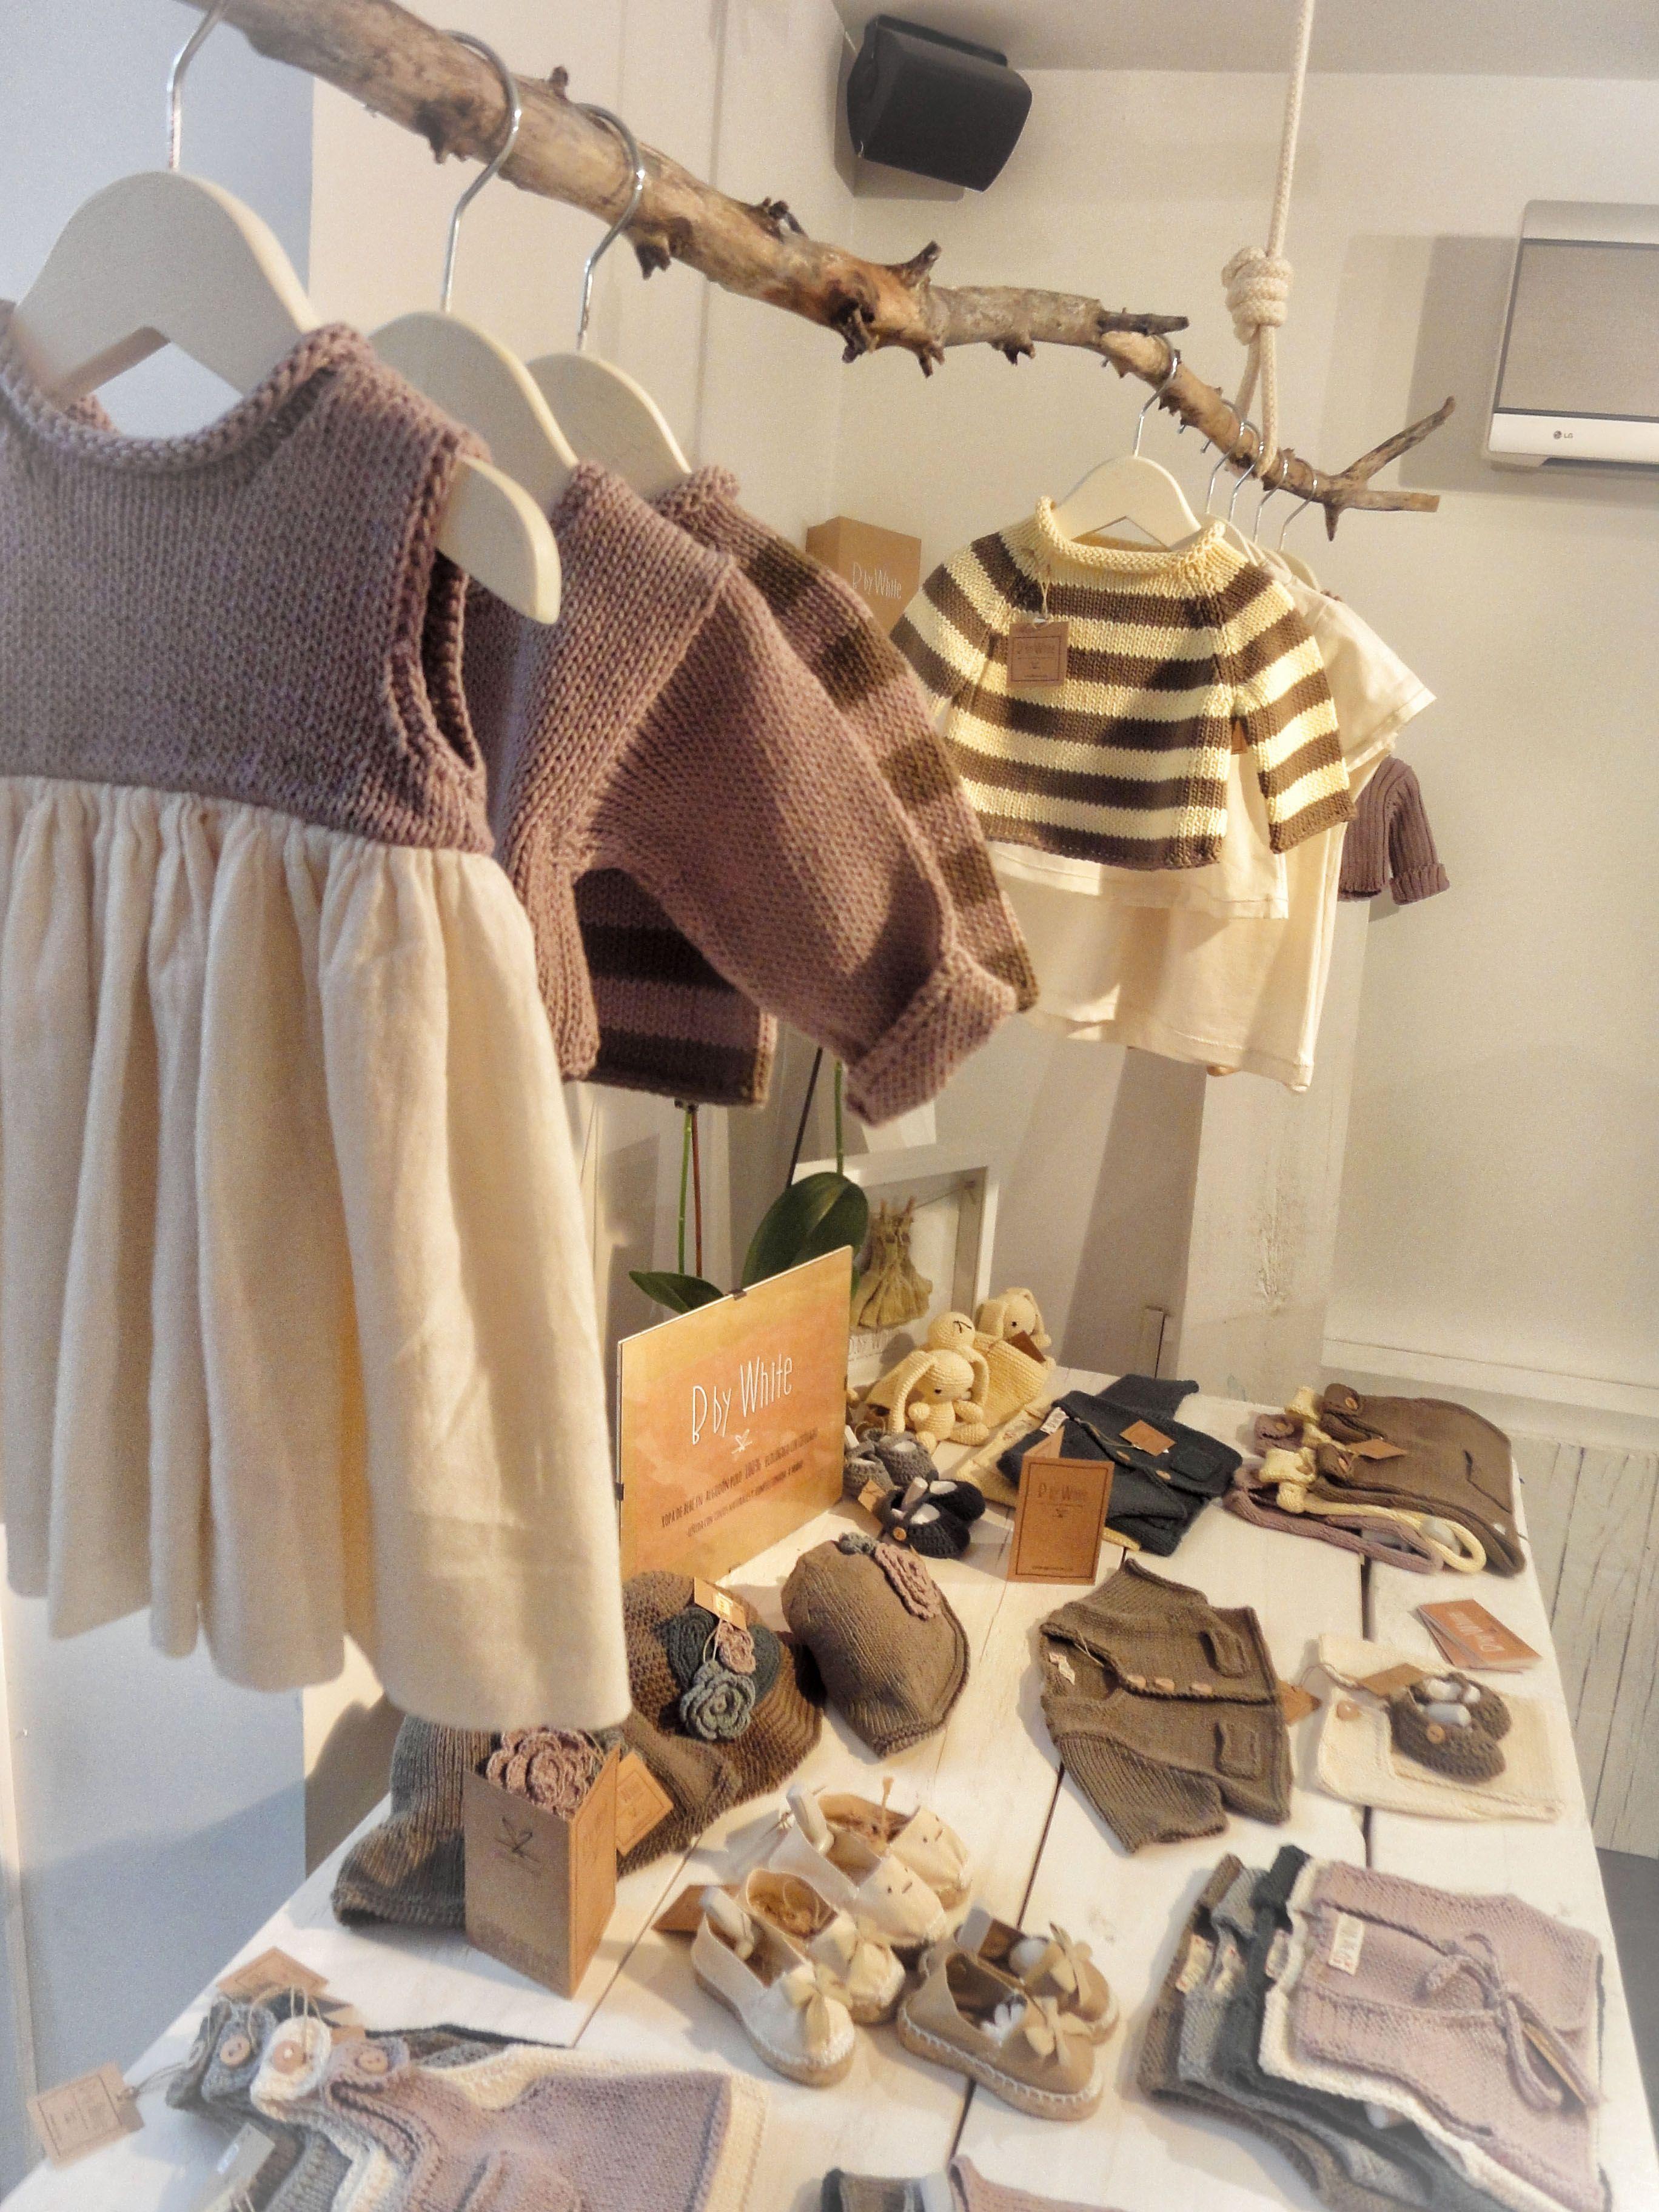 Enfant Terrible shop , bbywhite.com